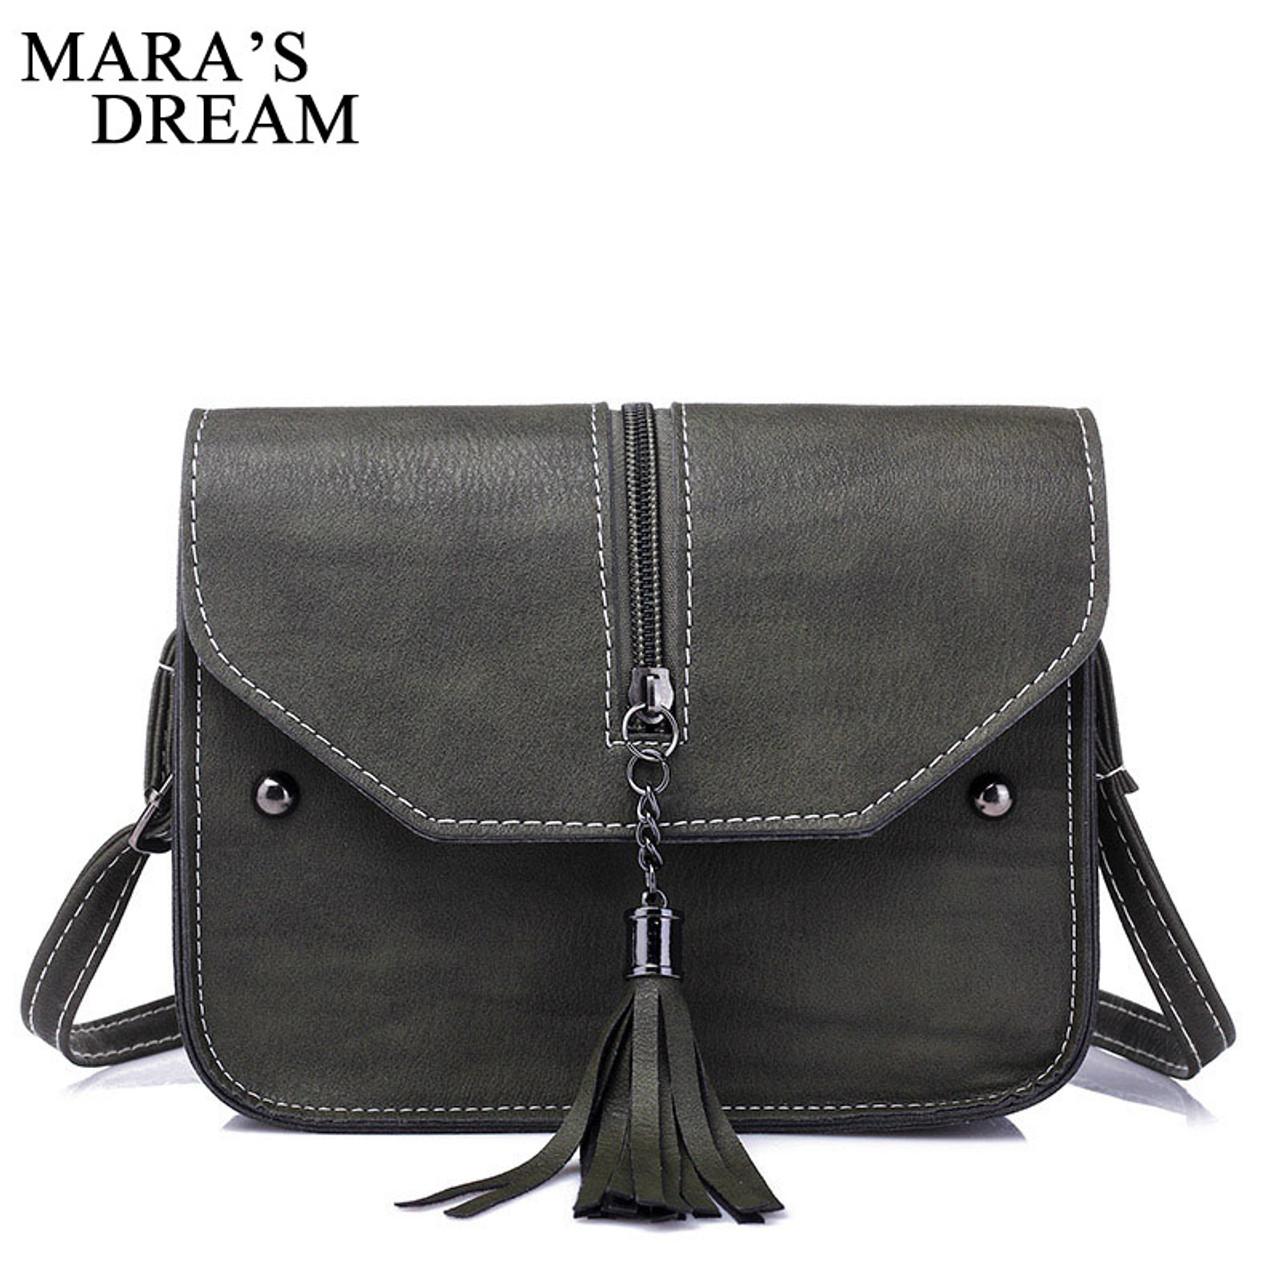 9b523336f7 ... Mara s Drea Brand 2018 New Vintage Casual PU Leather Women Handbags  Ladies Small Shopping Bag Shoulder ...